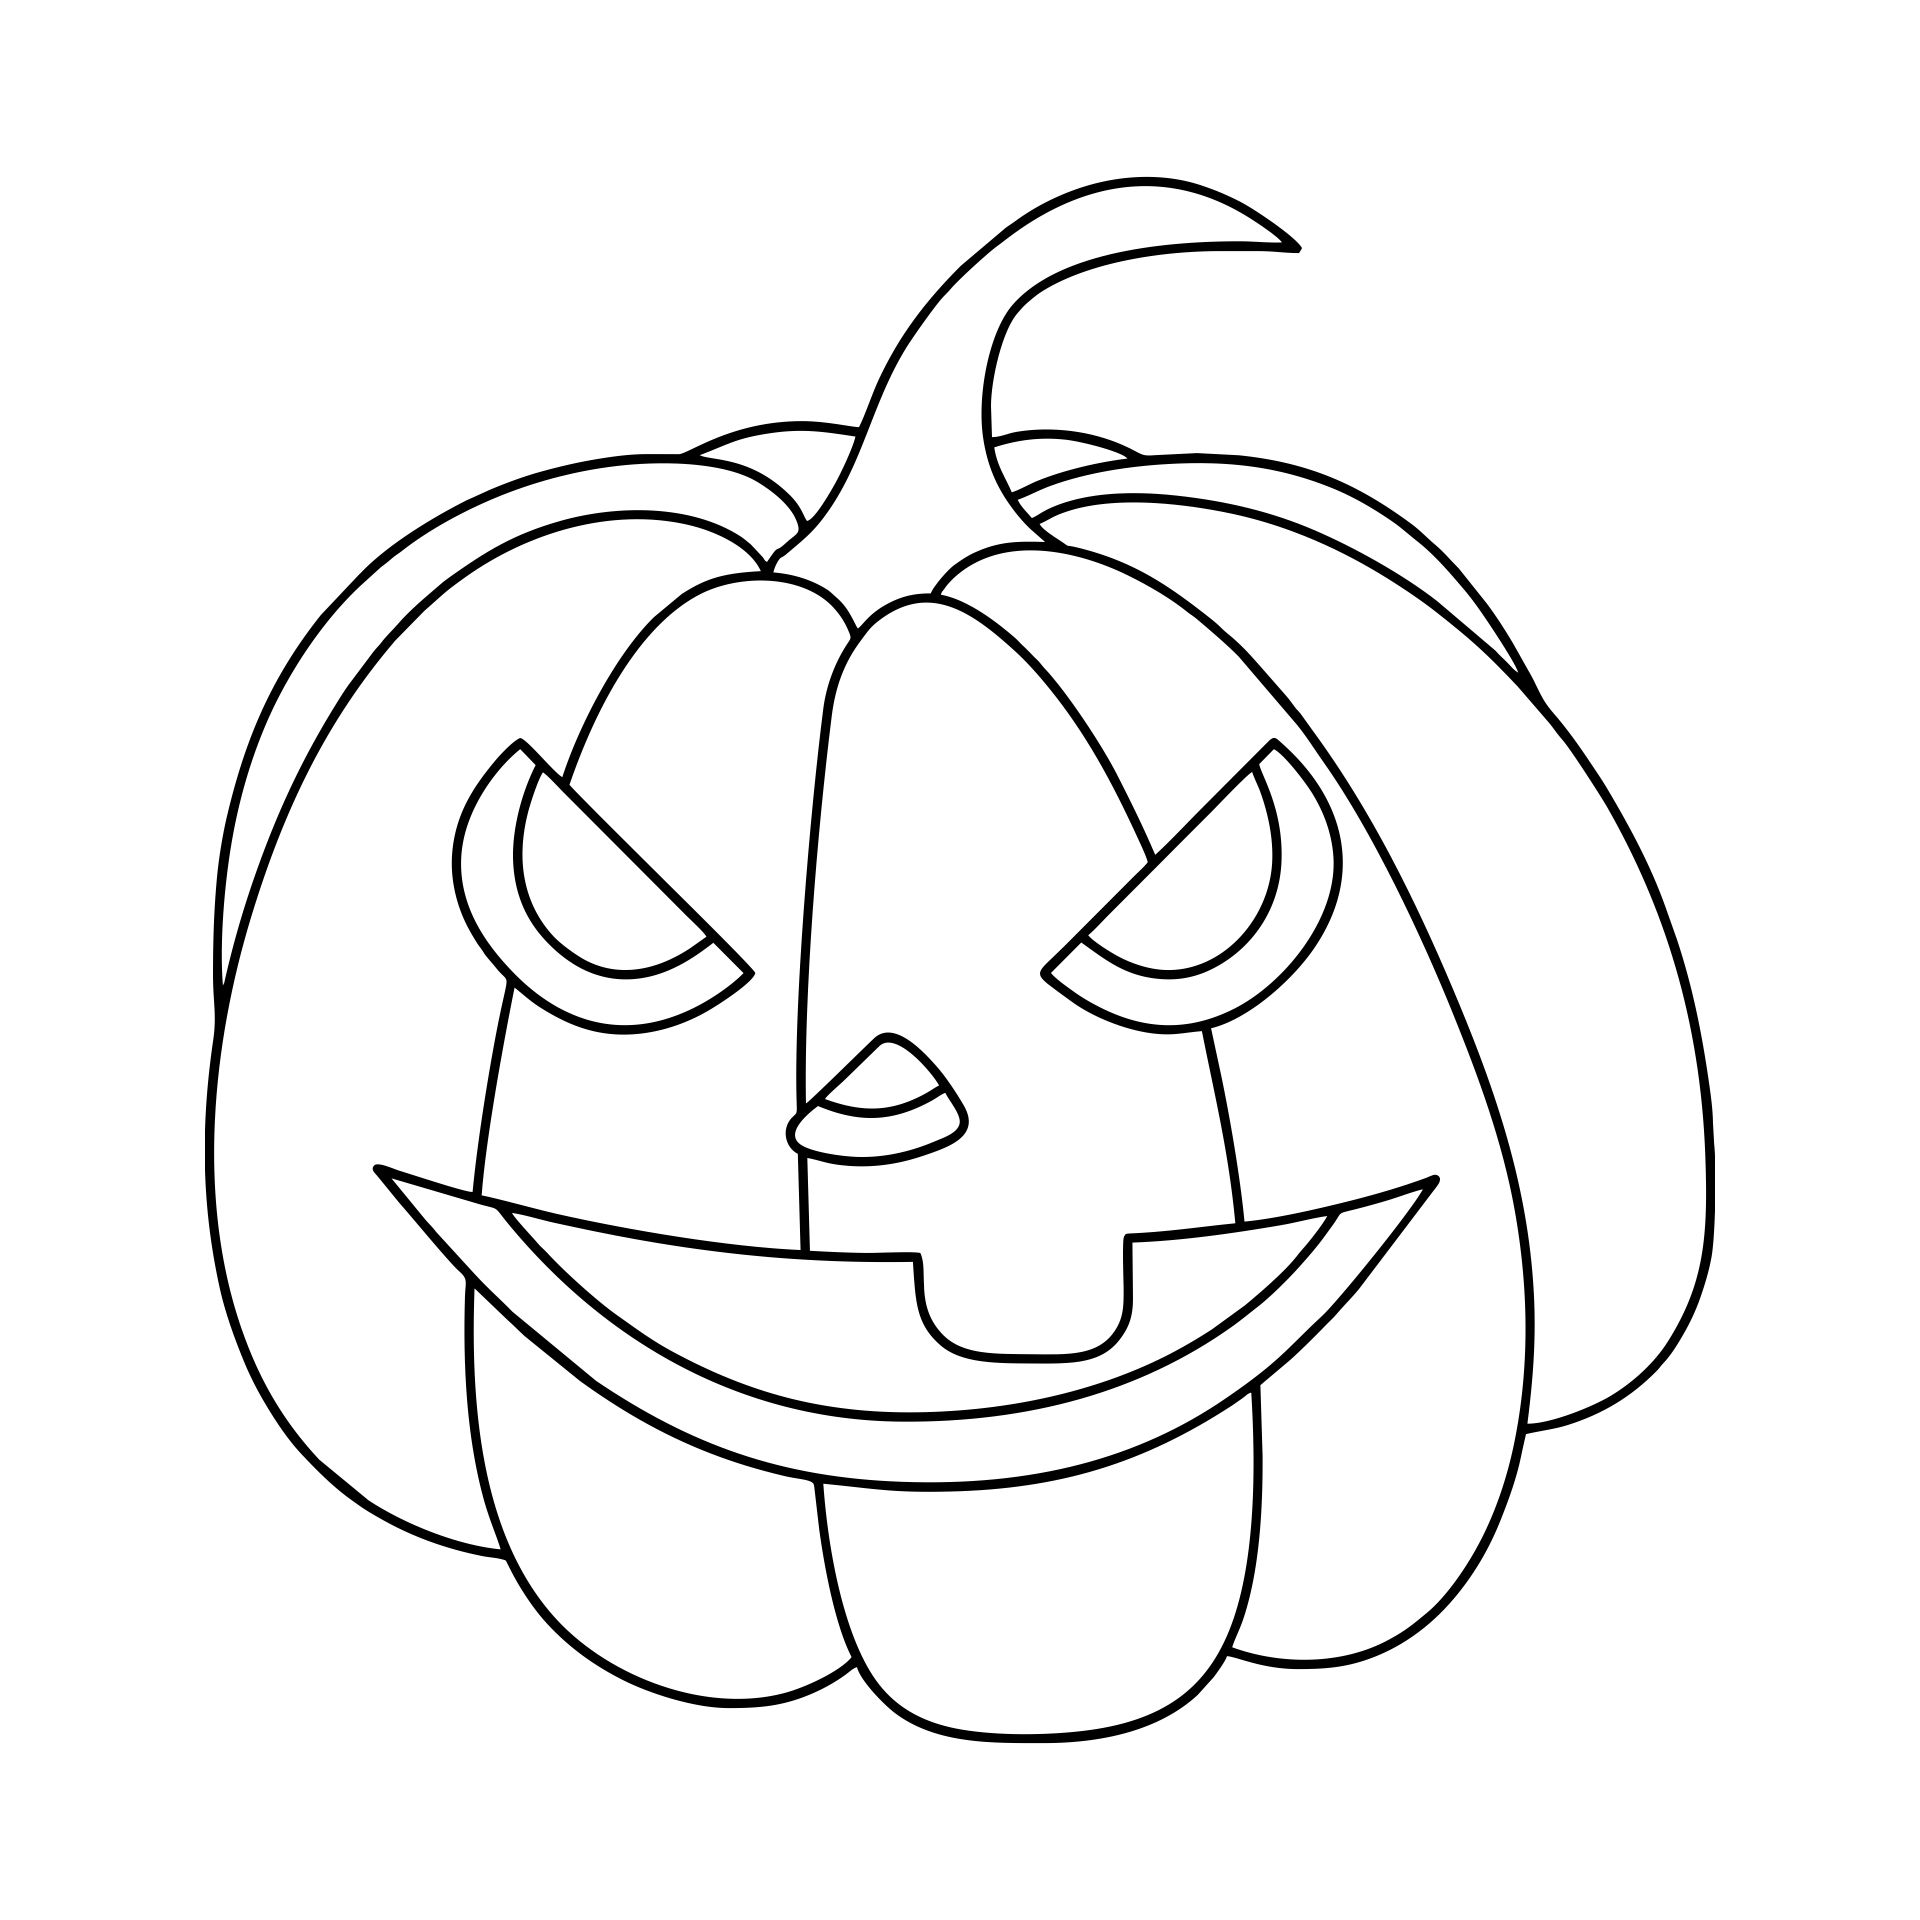 Printable Halloween Pumpkin Coloring Template